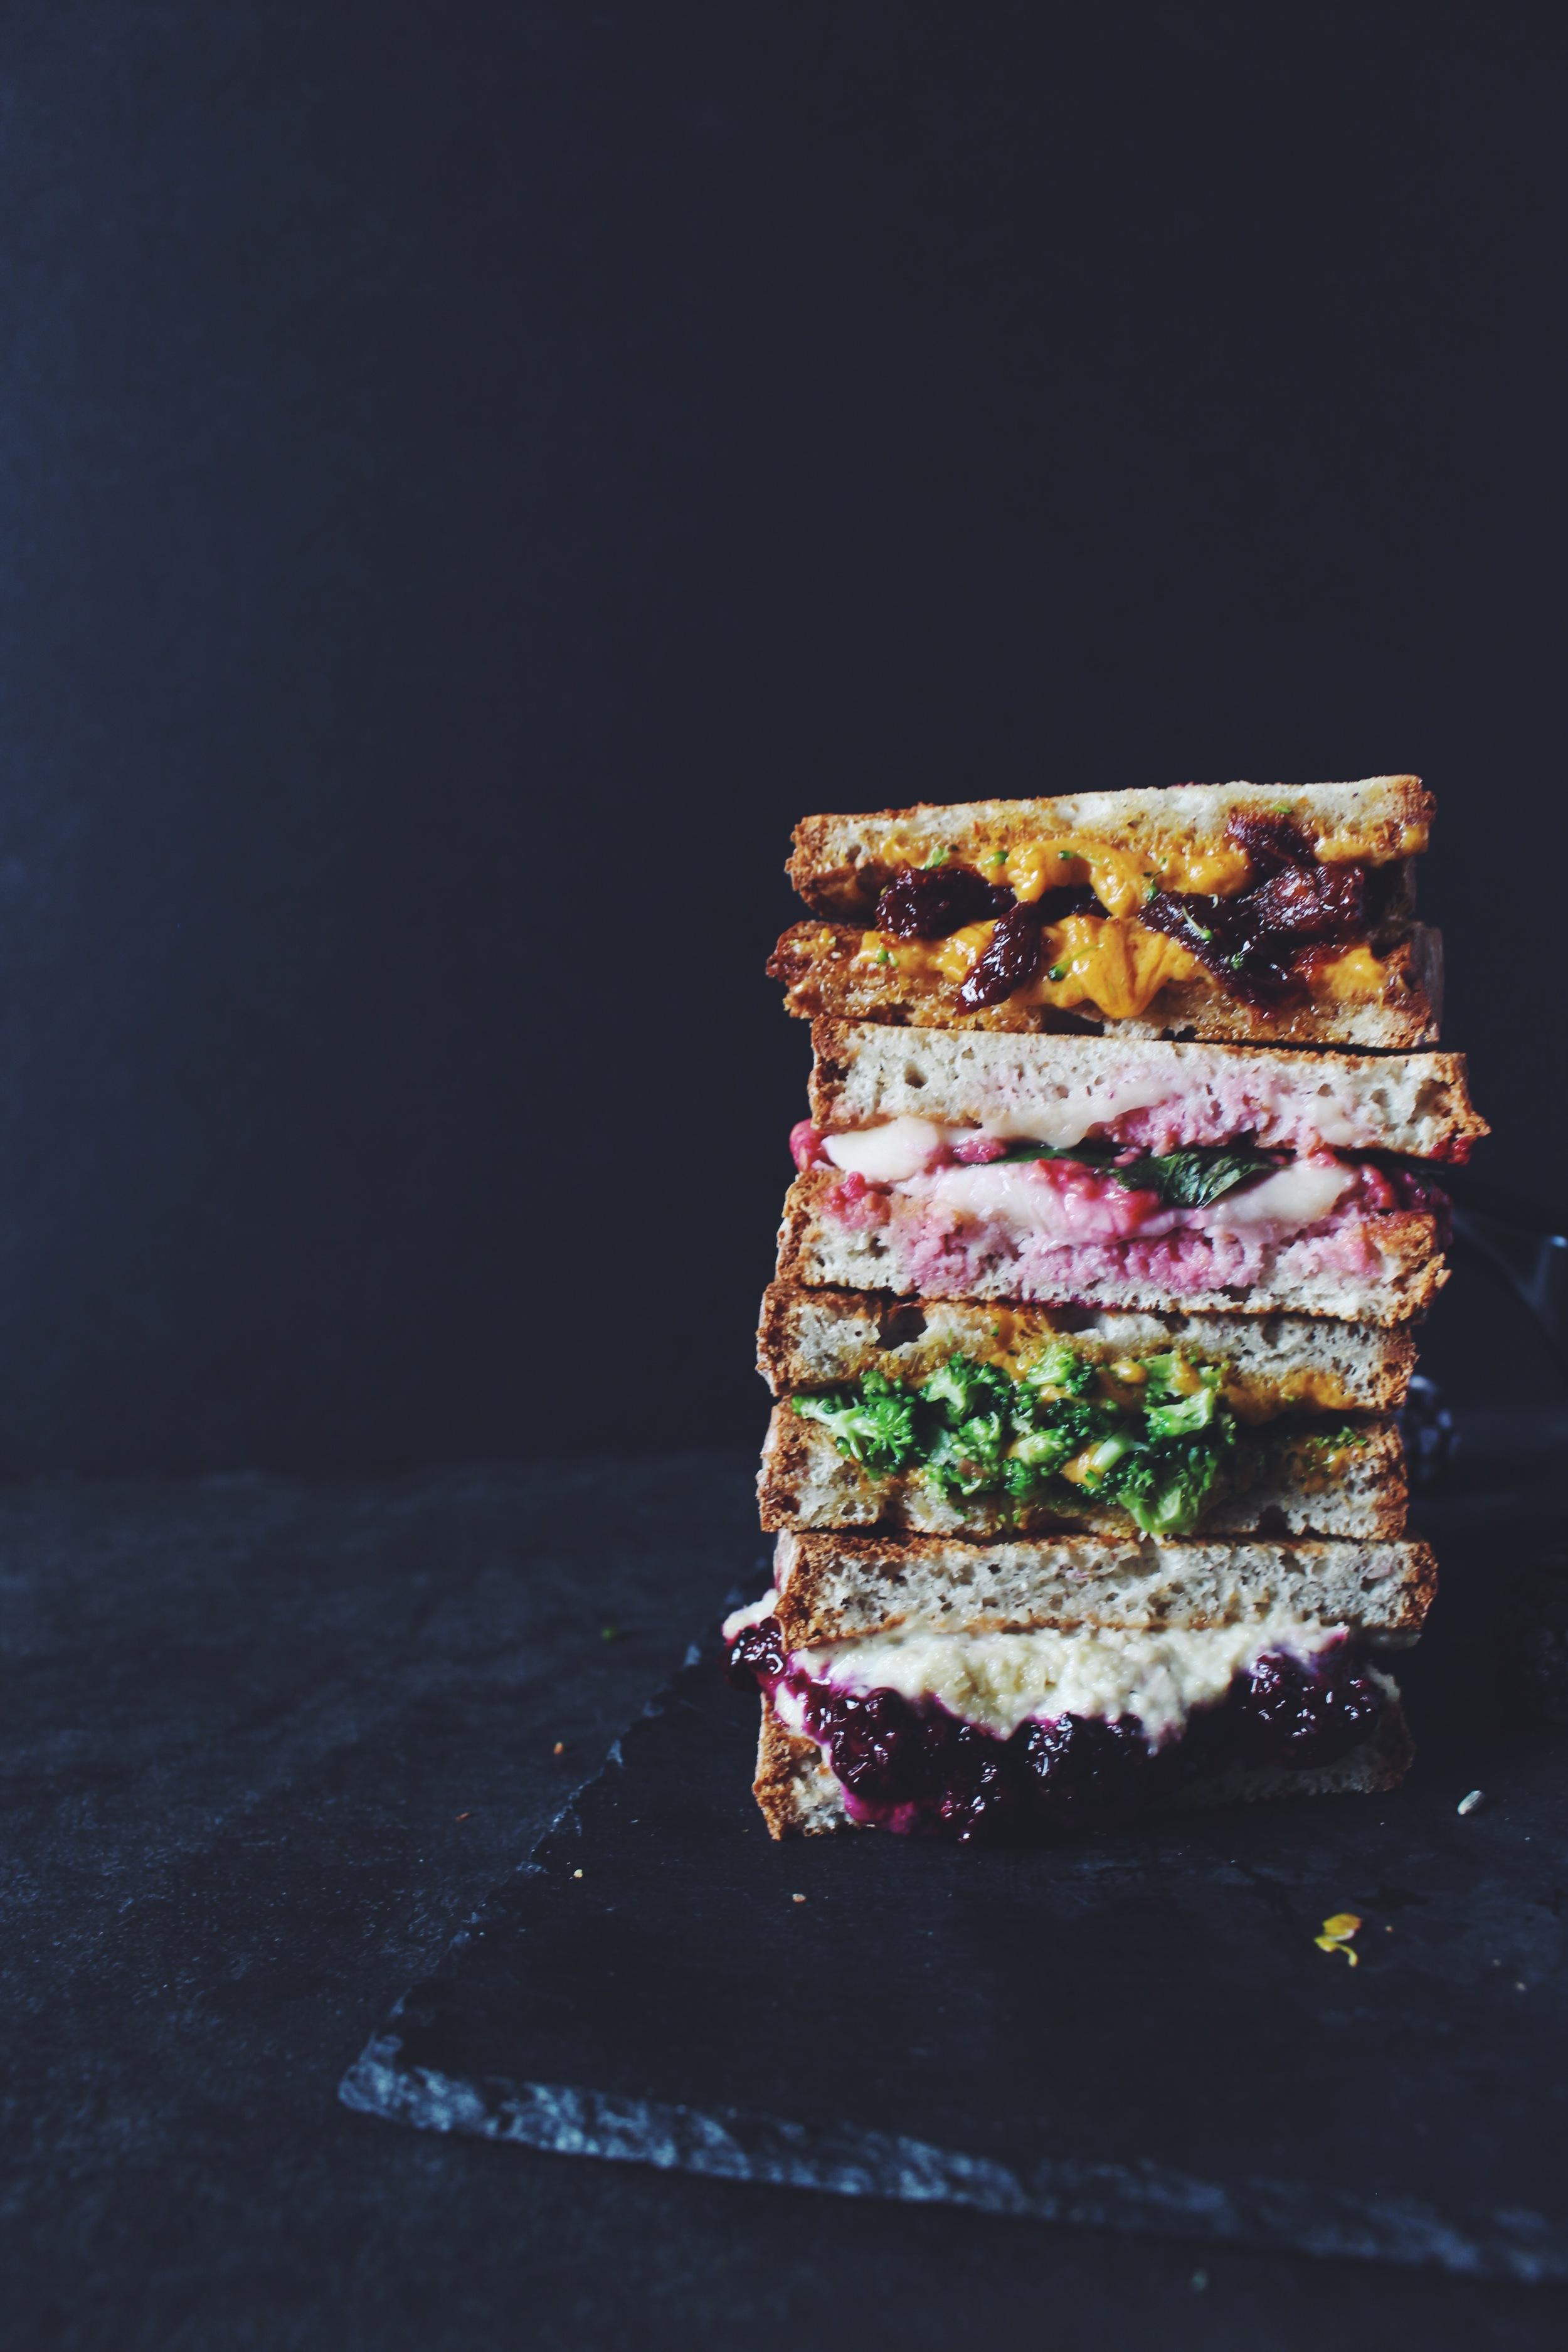 Vegan Grilled cheese sandwich recipes | Broccoli cheddar / raspberry basil / lavender lemon blackberry ricotta / sun dried tomato and cheddar / caramelized onion and cheddar